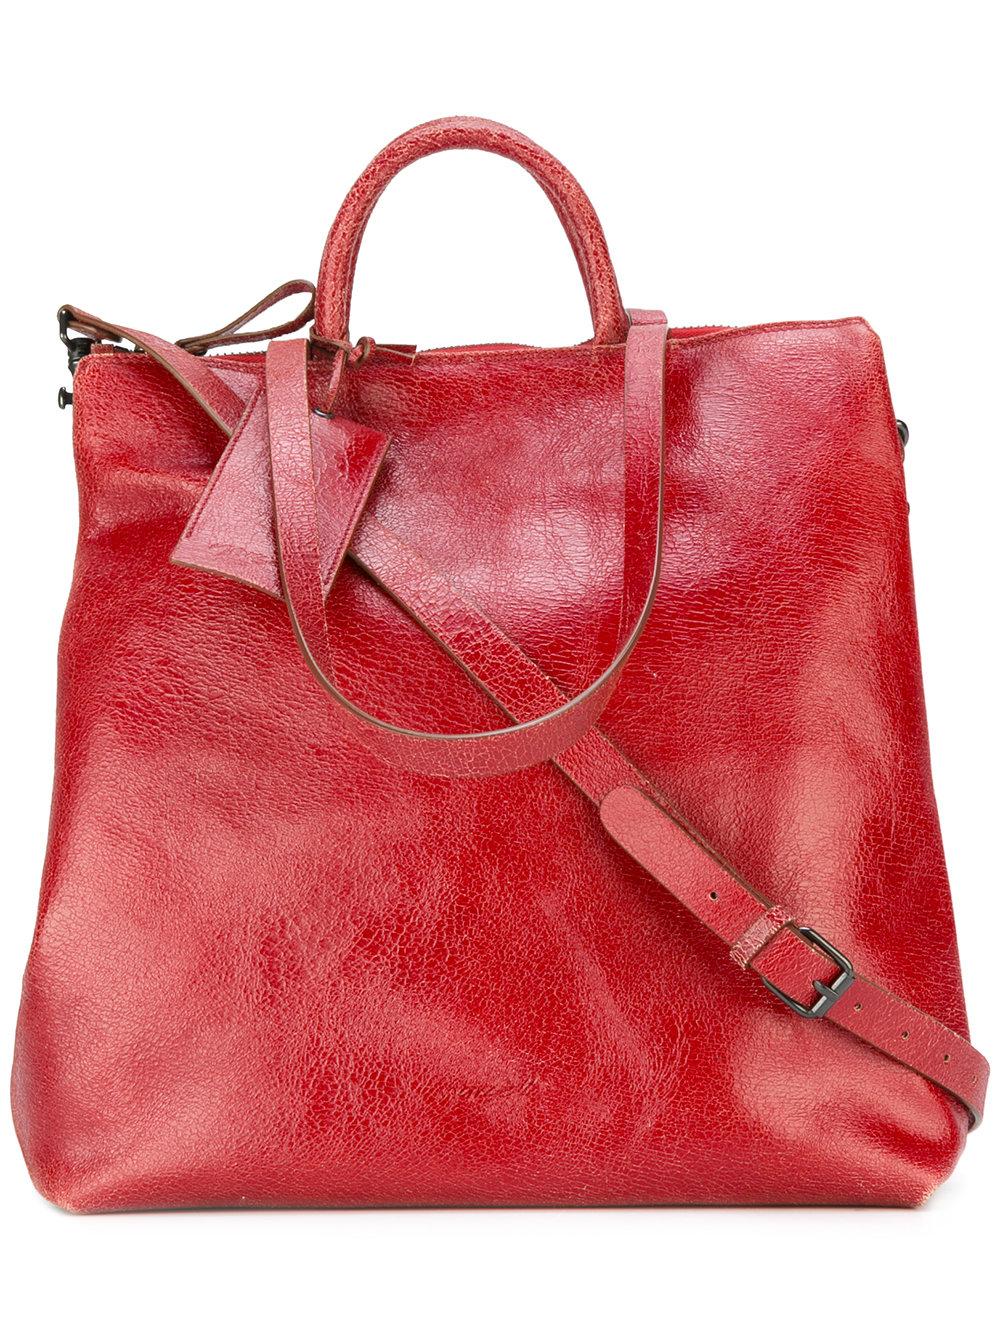 красная сумка тоут